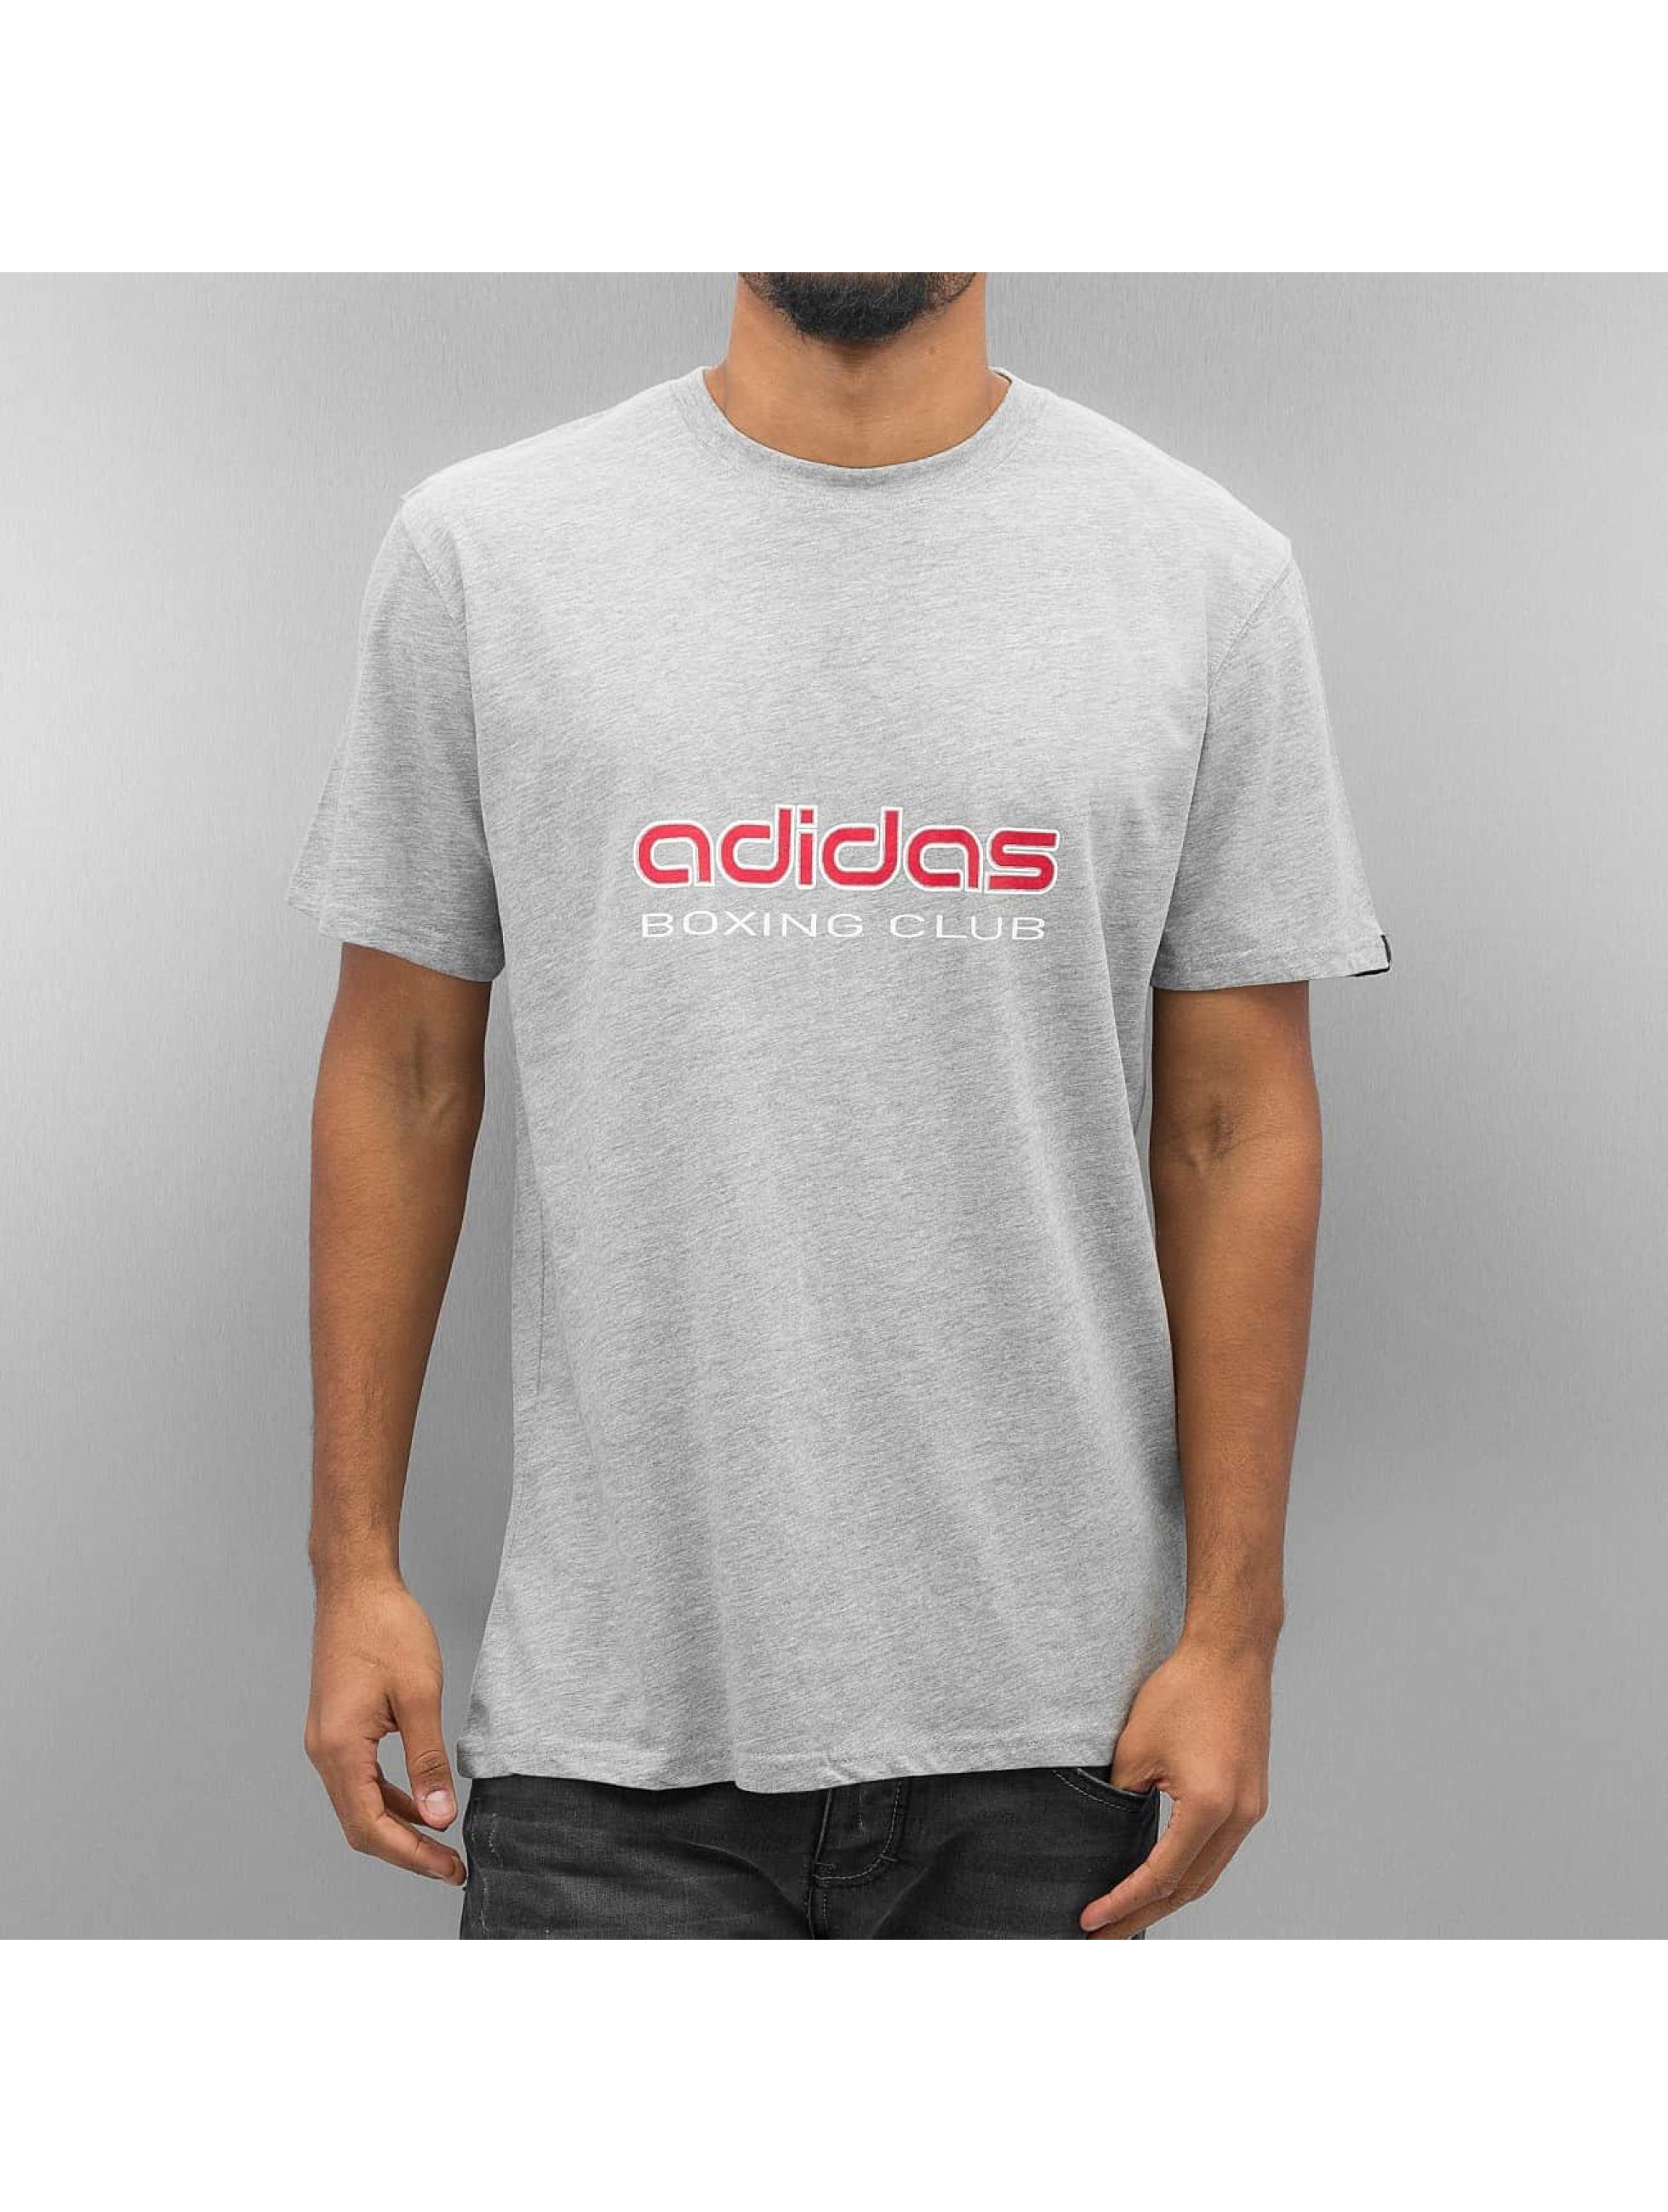 adidas Boxing MMA Männer T-Shirt Boxing Club in grau